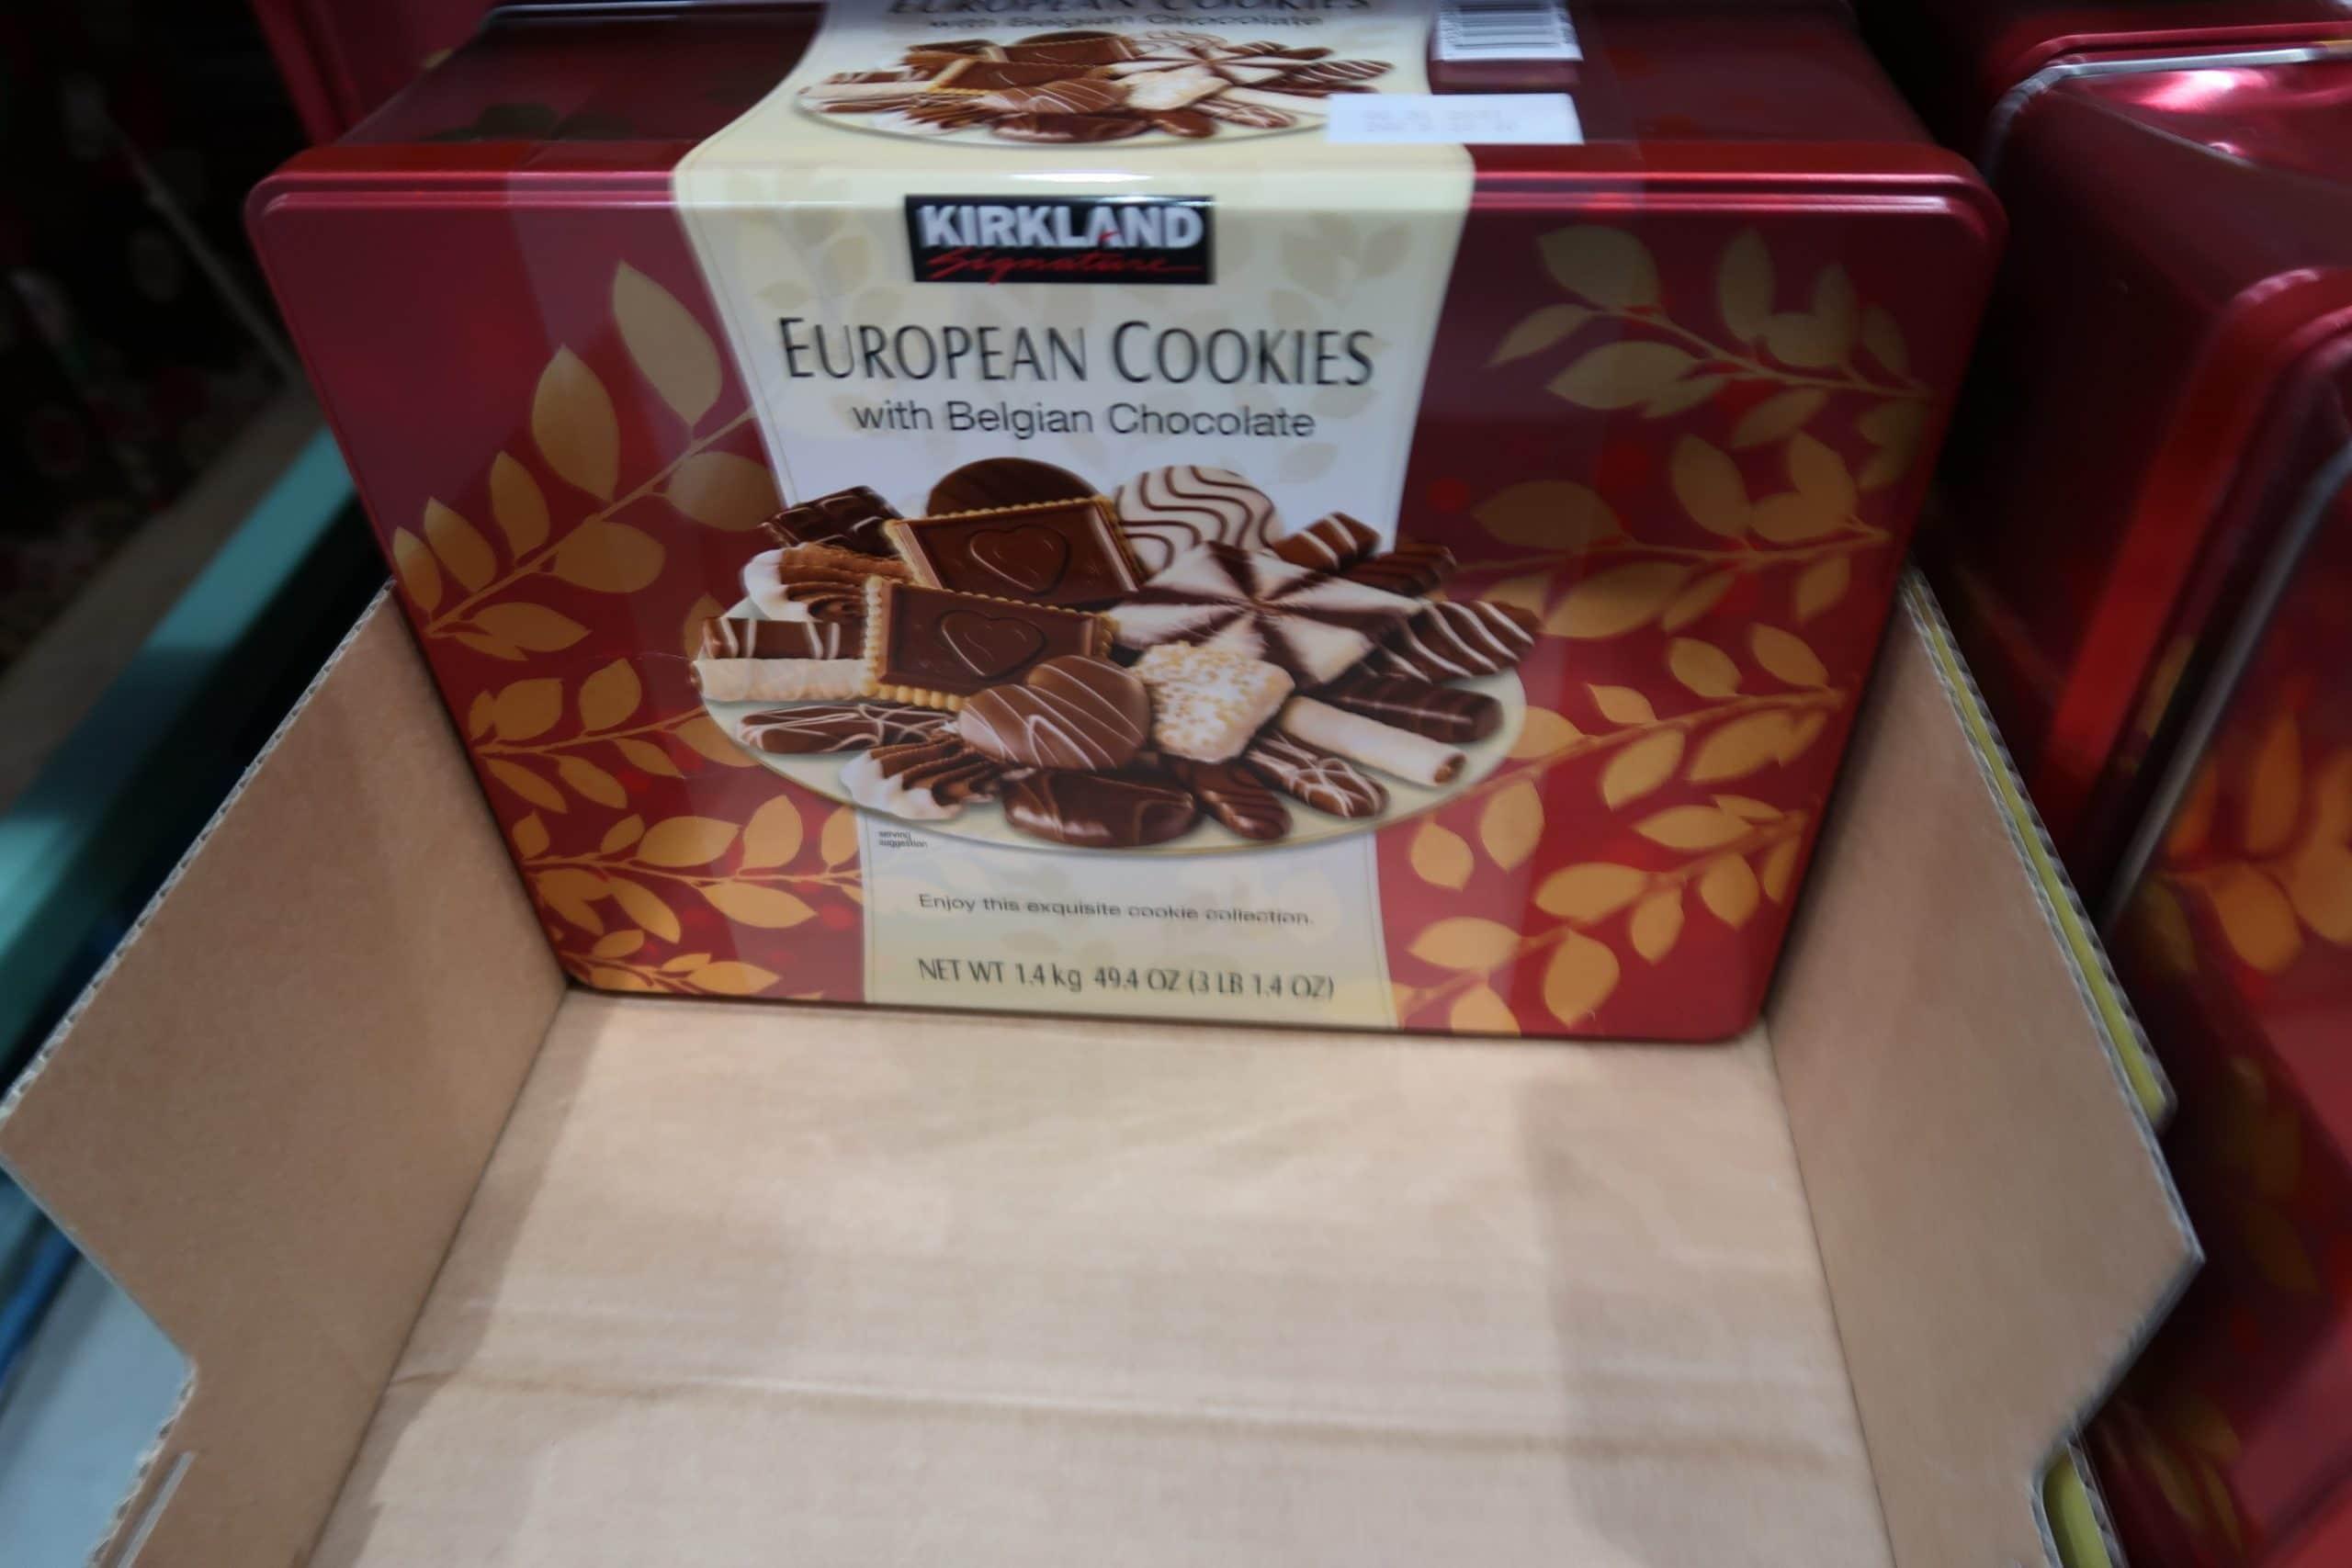 Kirkland European Belgian Chocolate Cookies $8.97